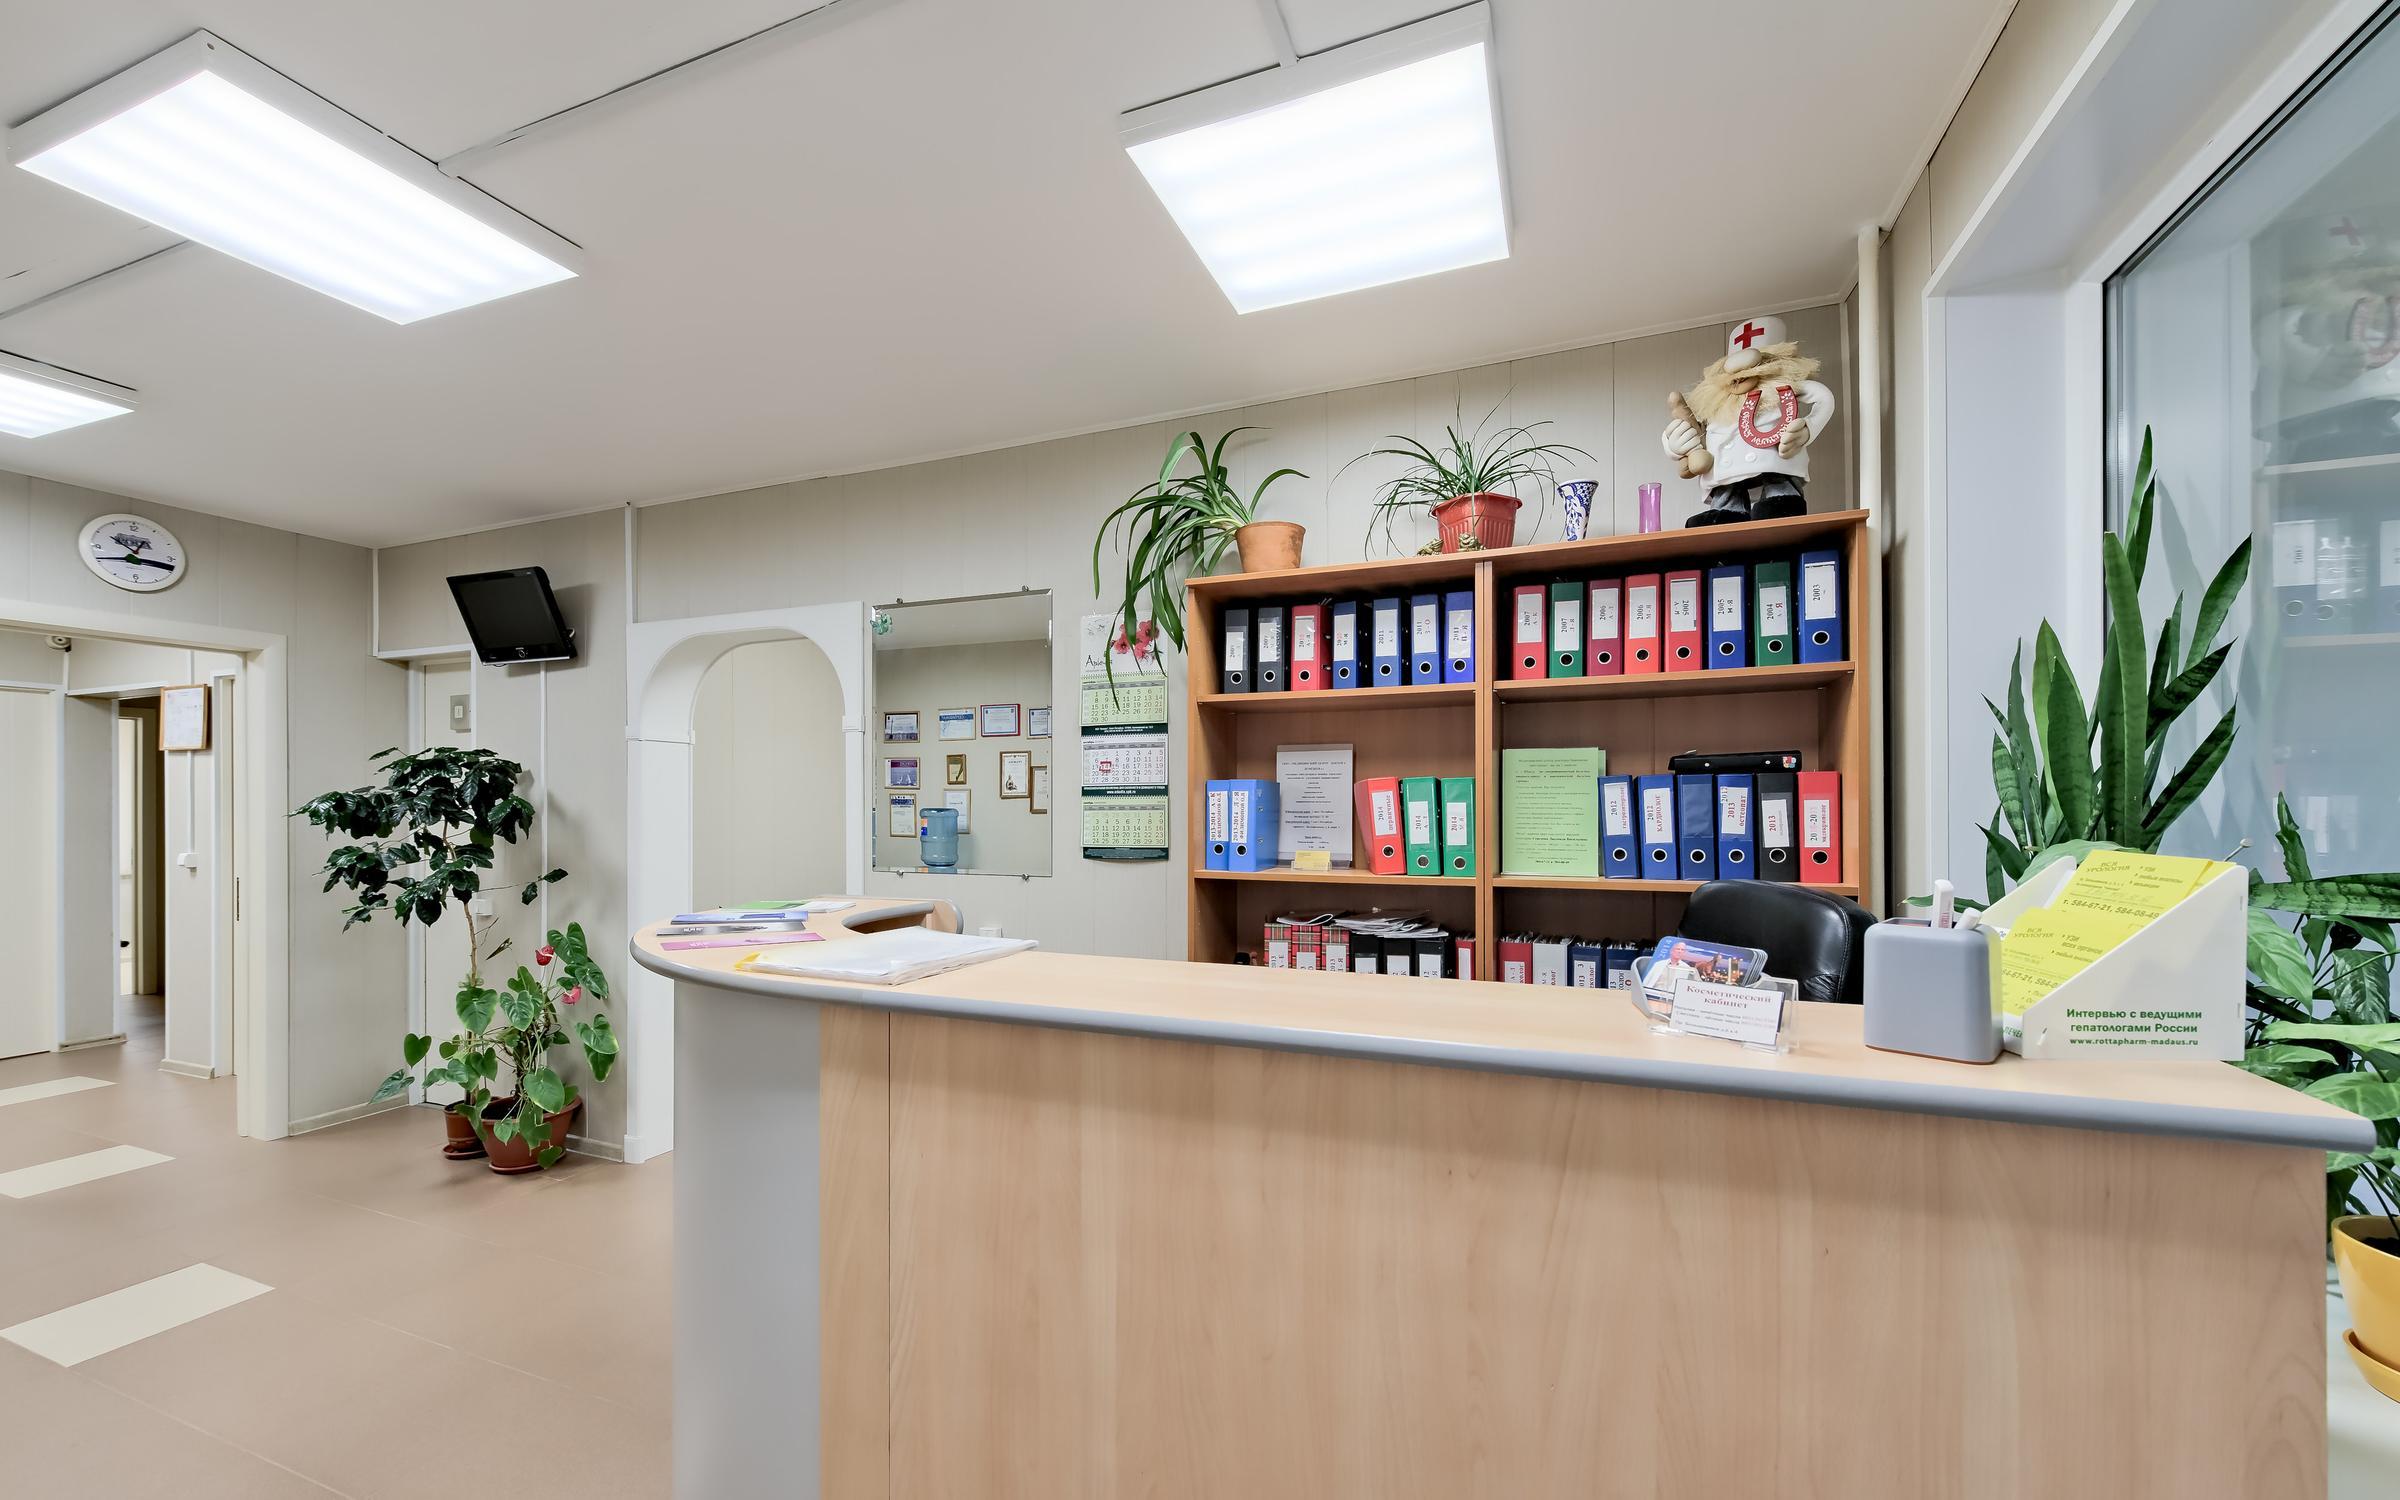 фотография Медицинского центра доктора Лемешева